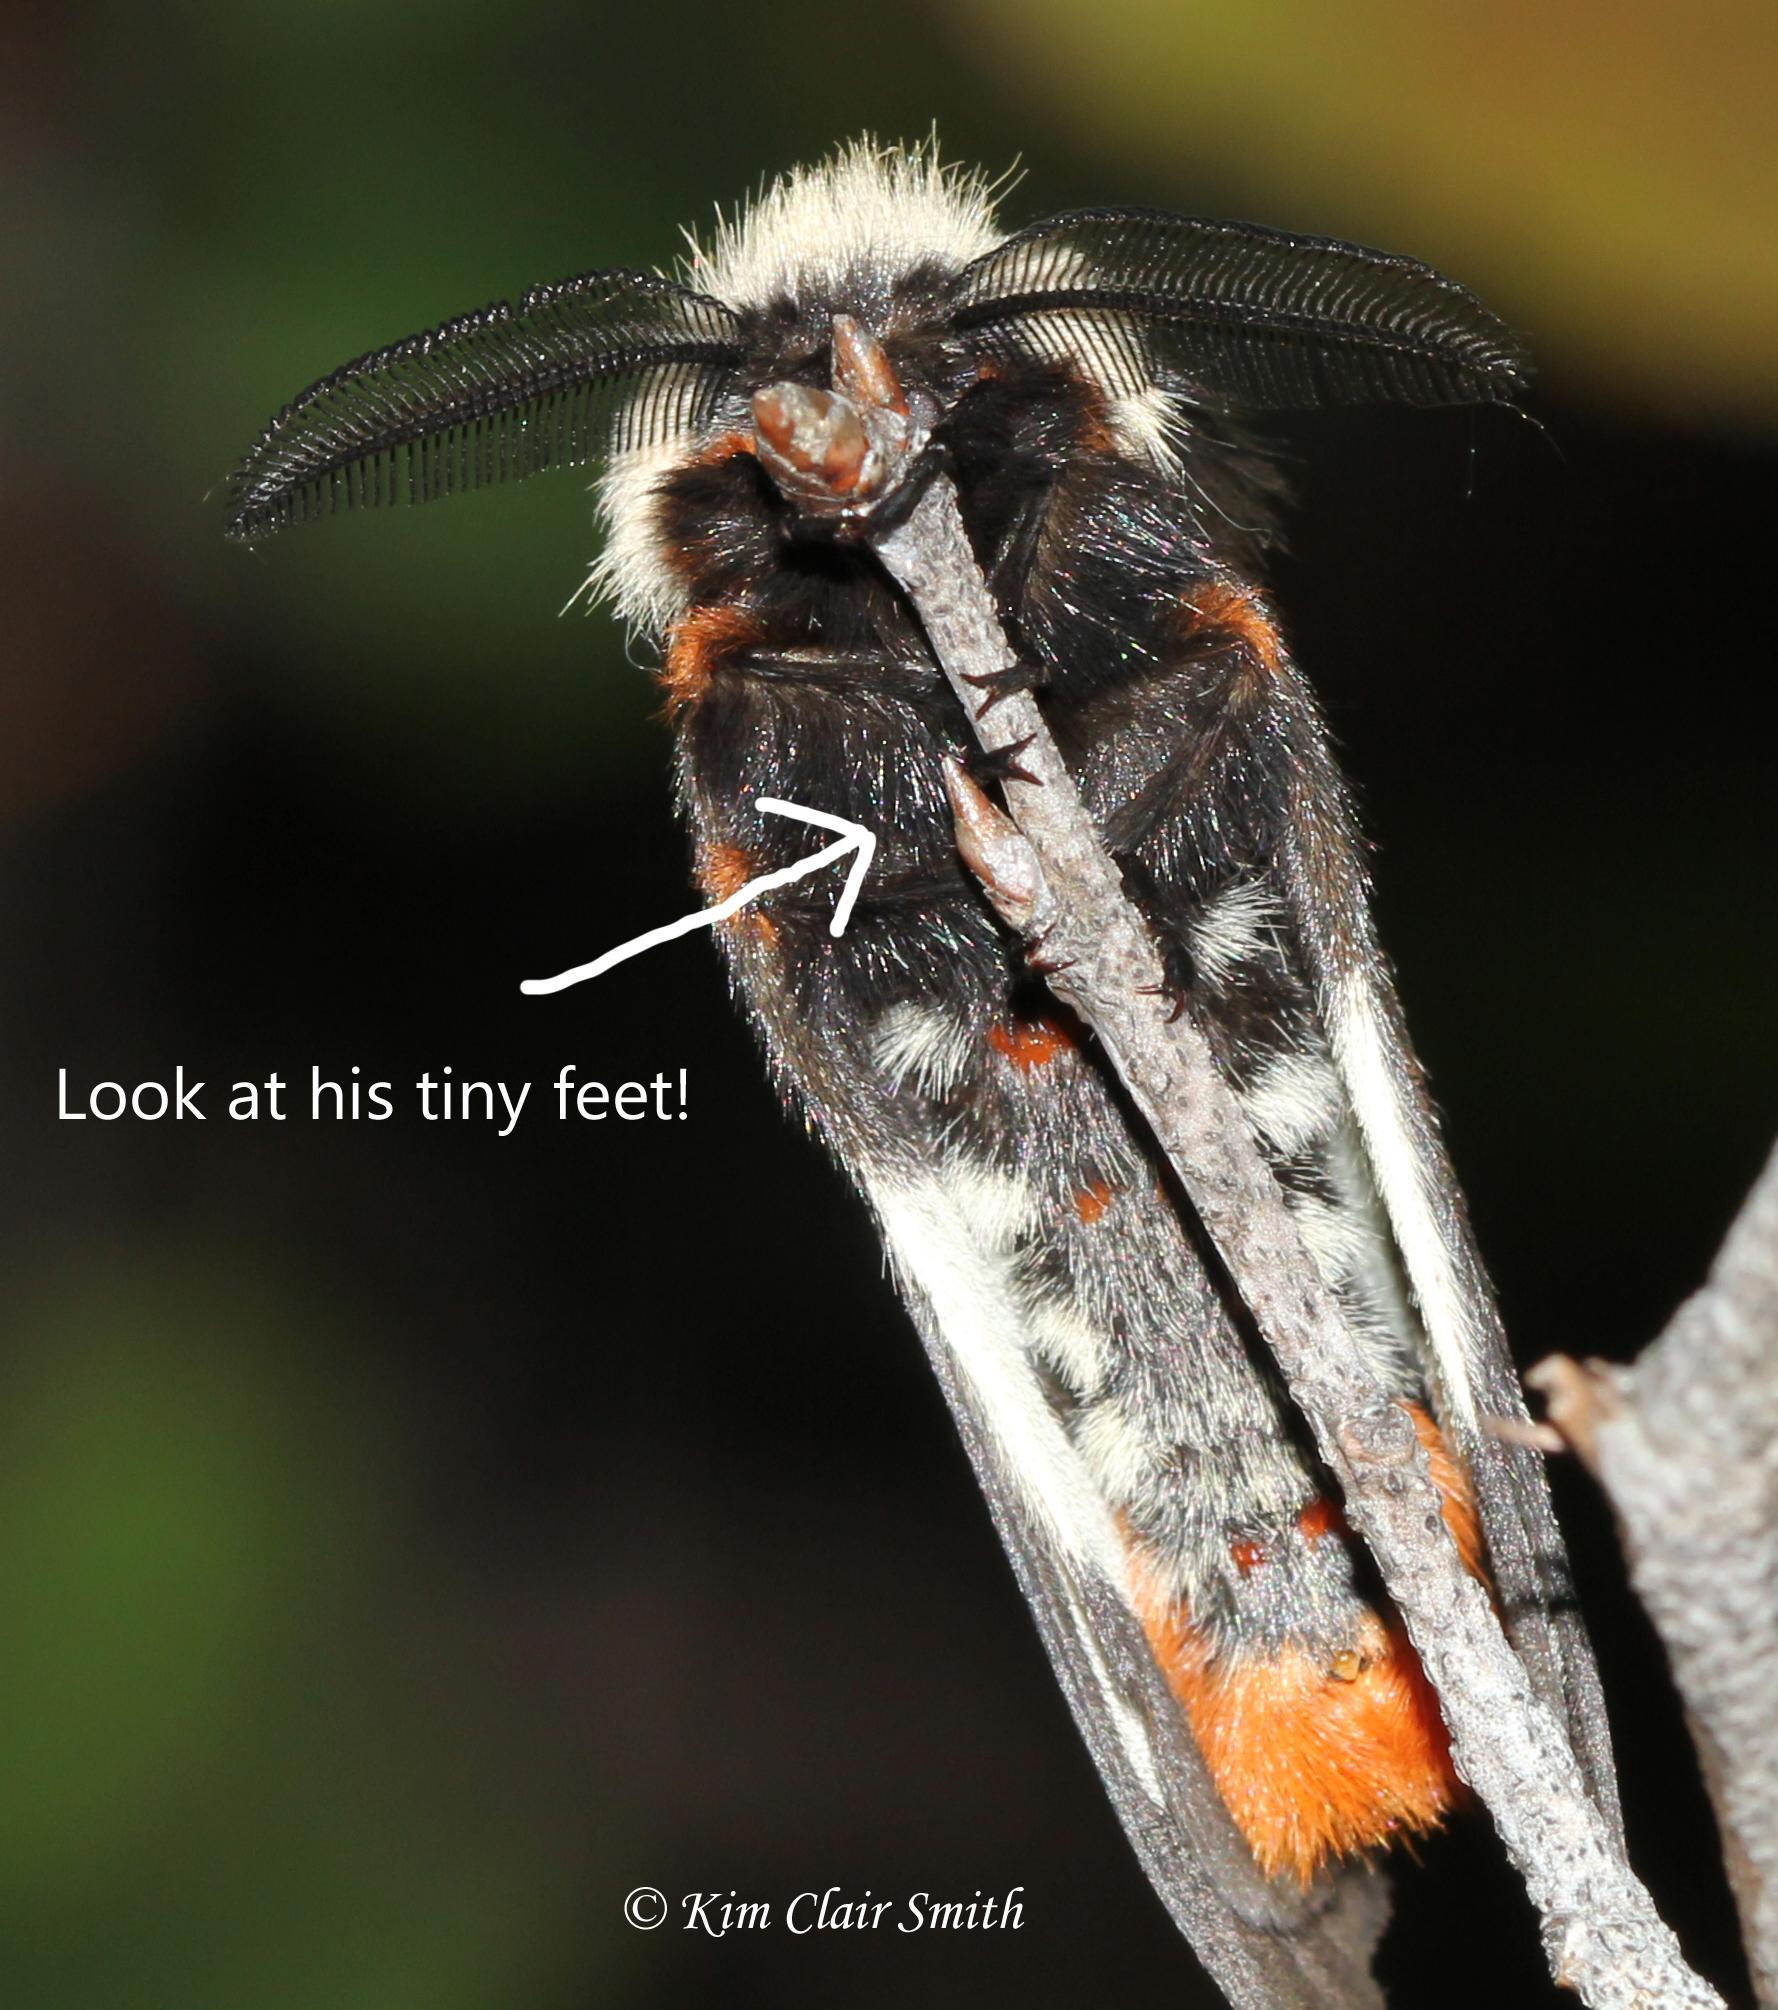 Buck moth with arrow to tiny feet